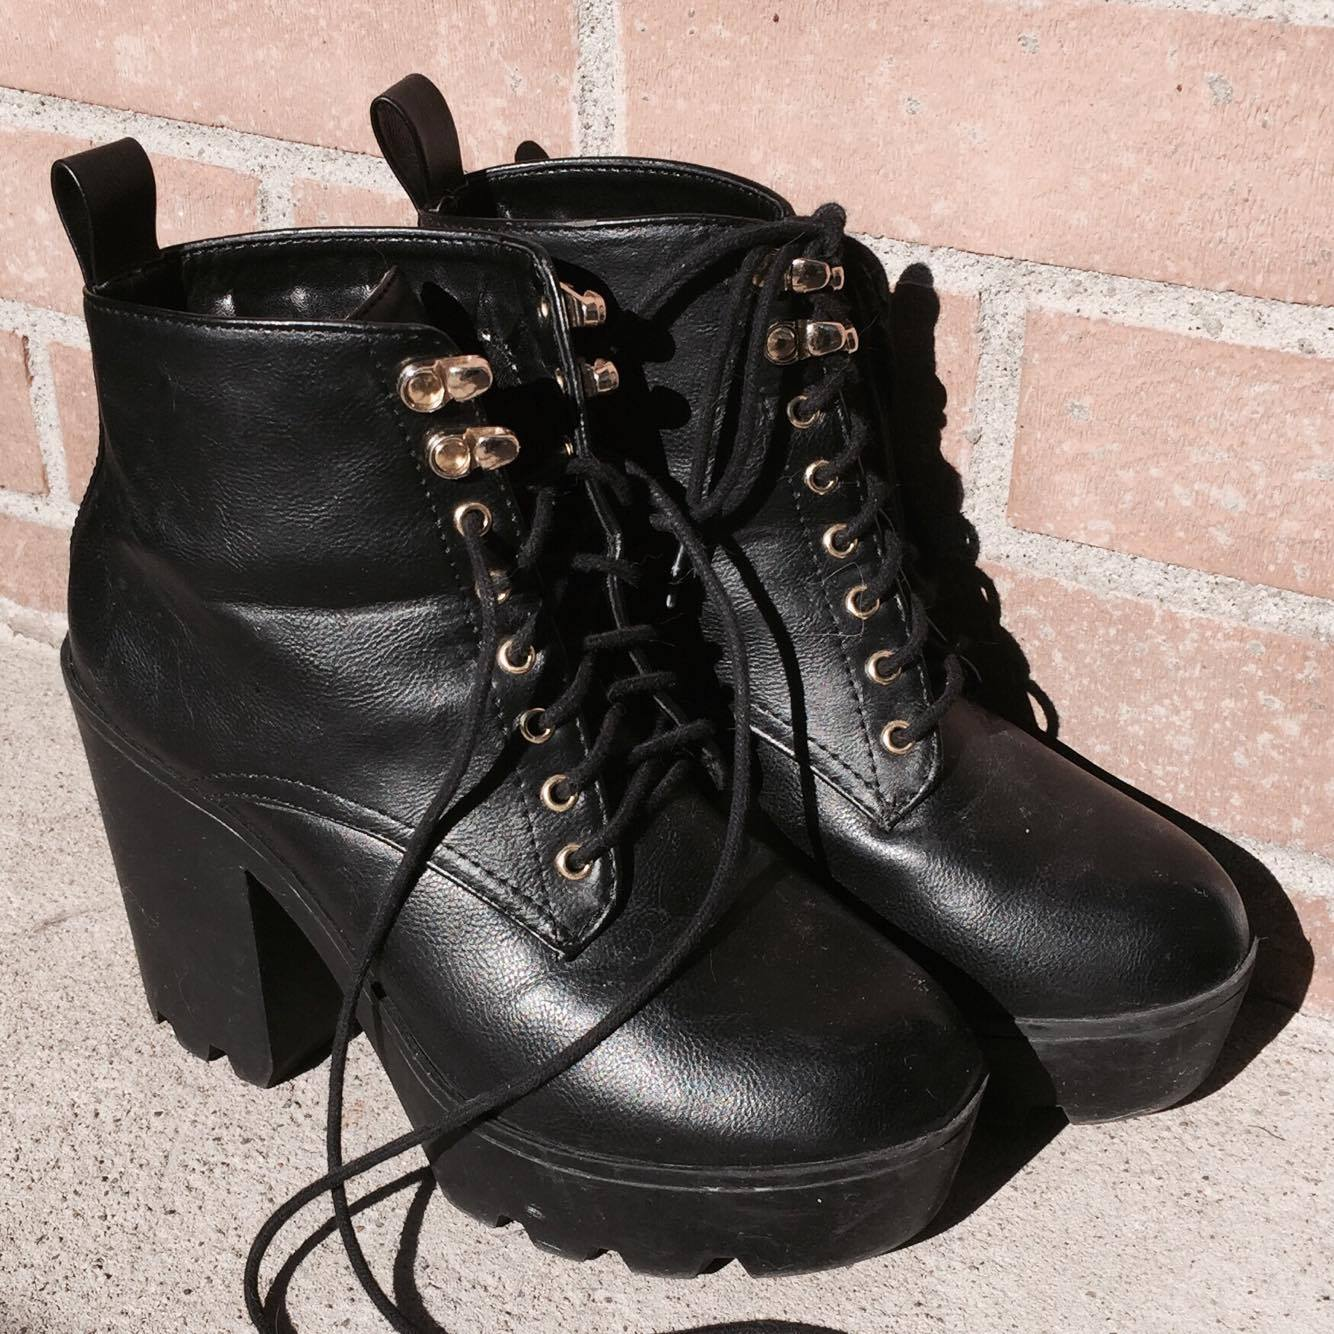 bottes noires boots fashion mode talons style